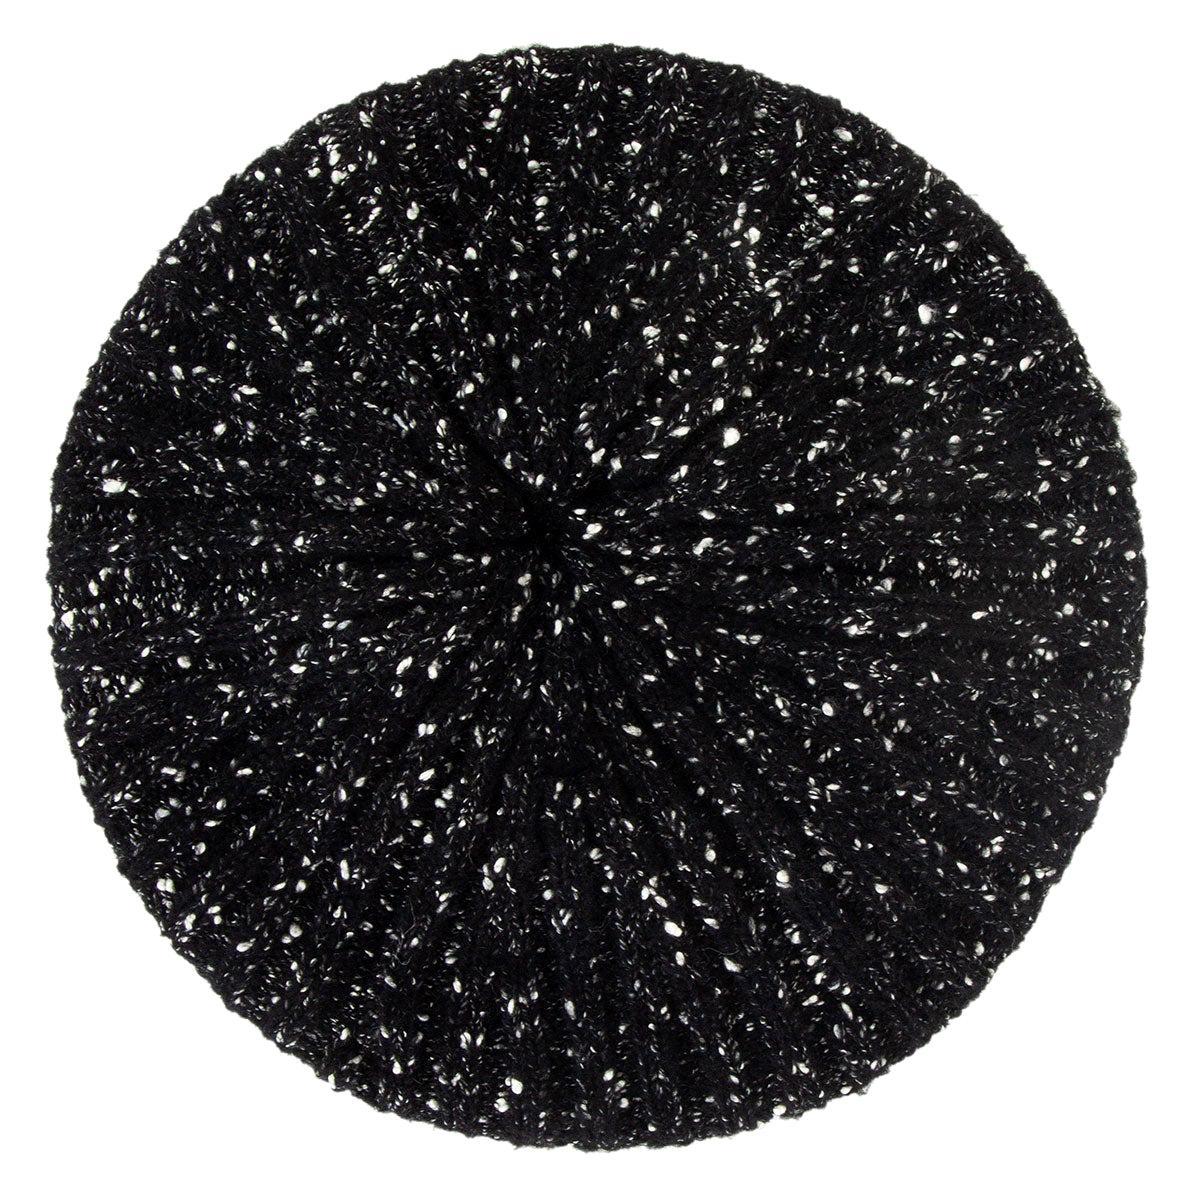 CHANEL black & white wool & cotton KNIT BERET Hat